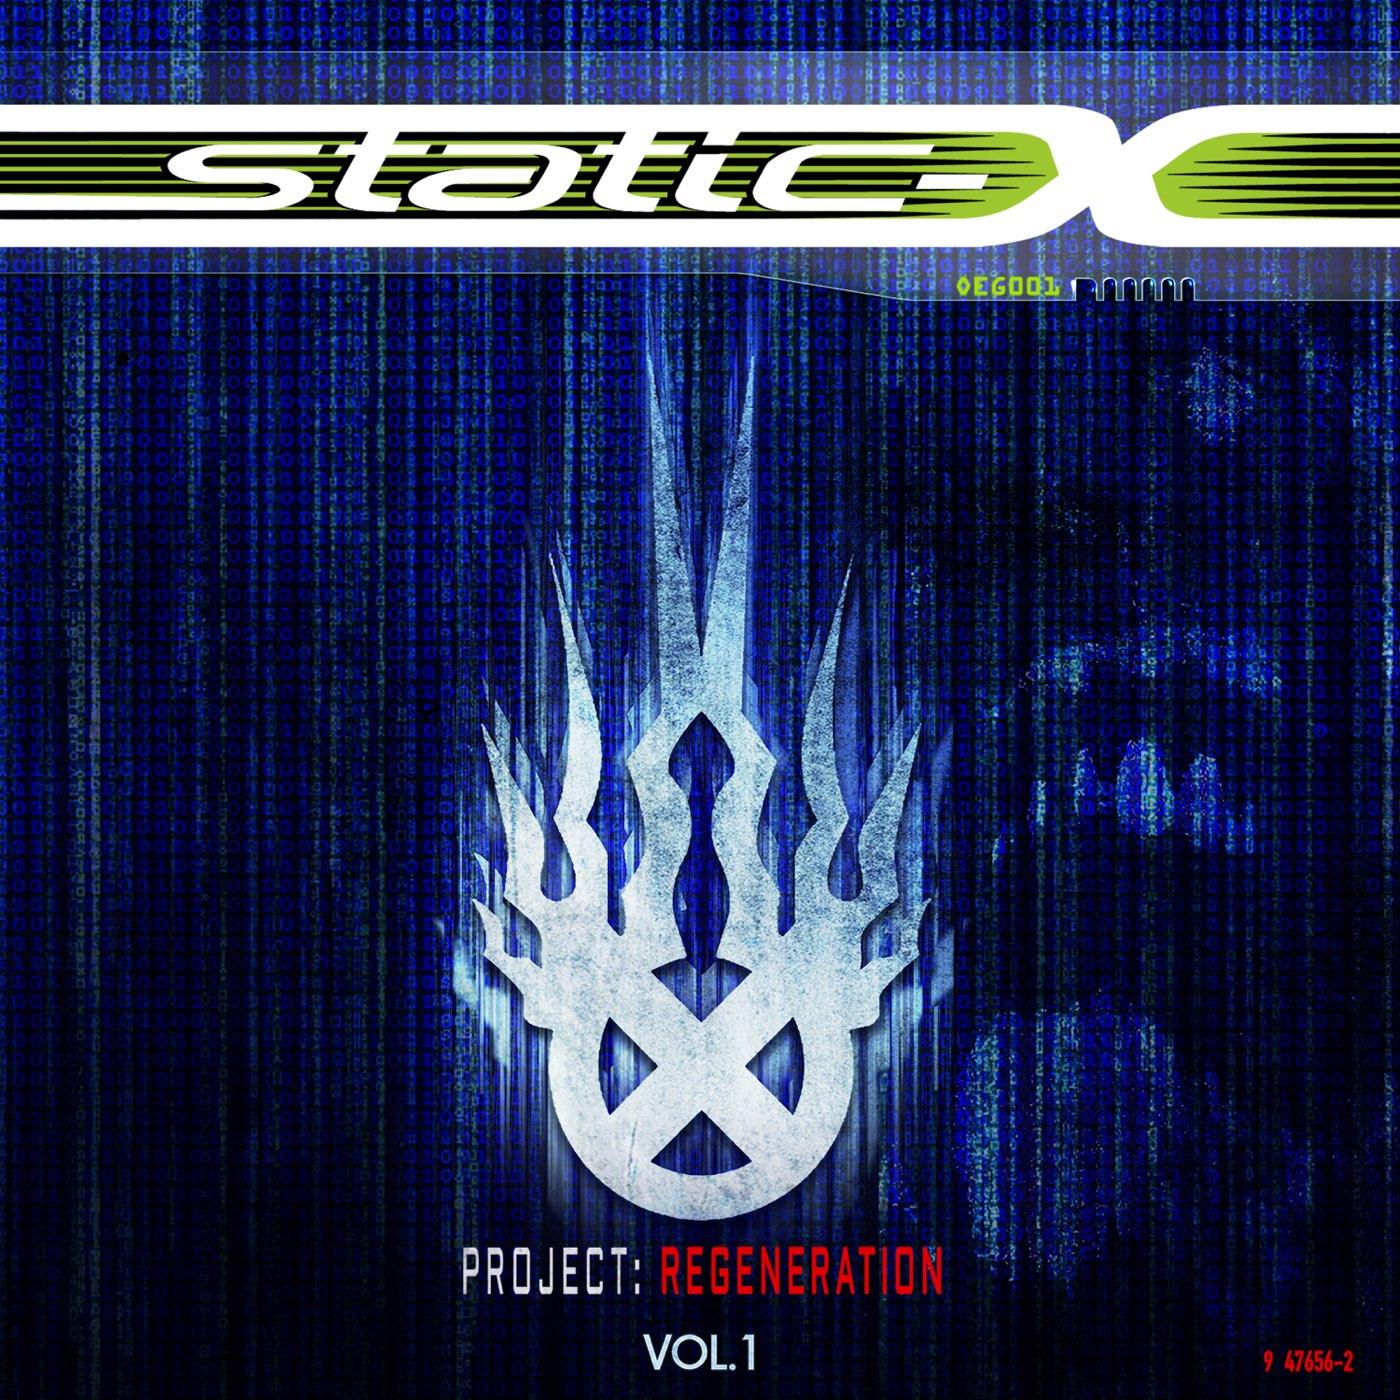 Static-X - Project Regeneration Vol.1 (2020)